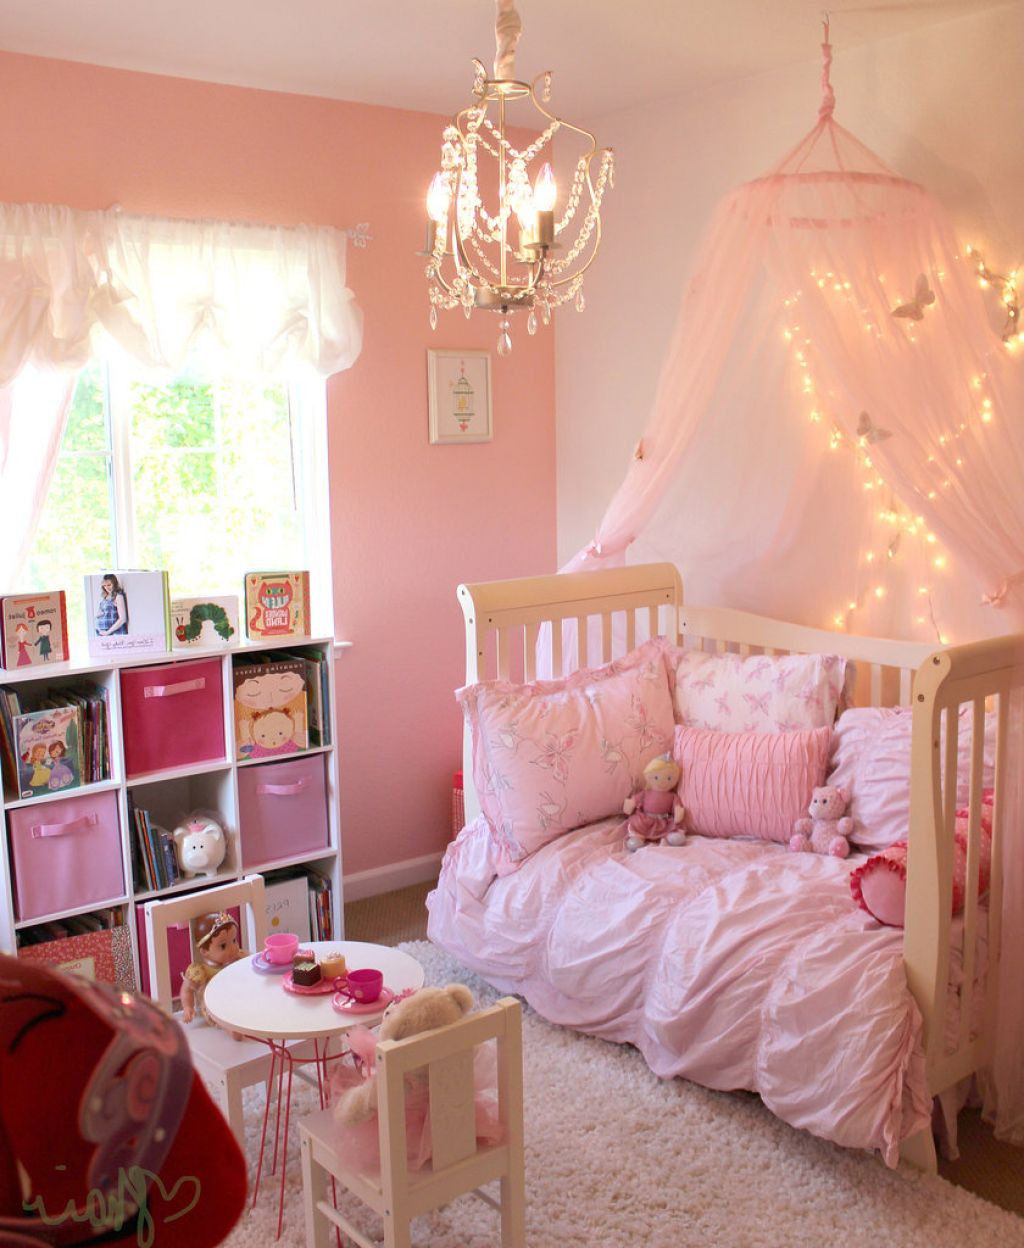 Kids Princess Room  32 Dreamy Bedroom Designs For Your Little Princess